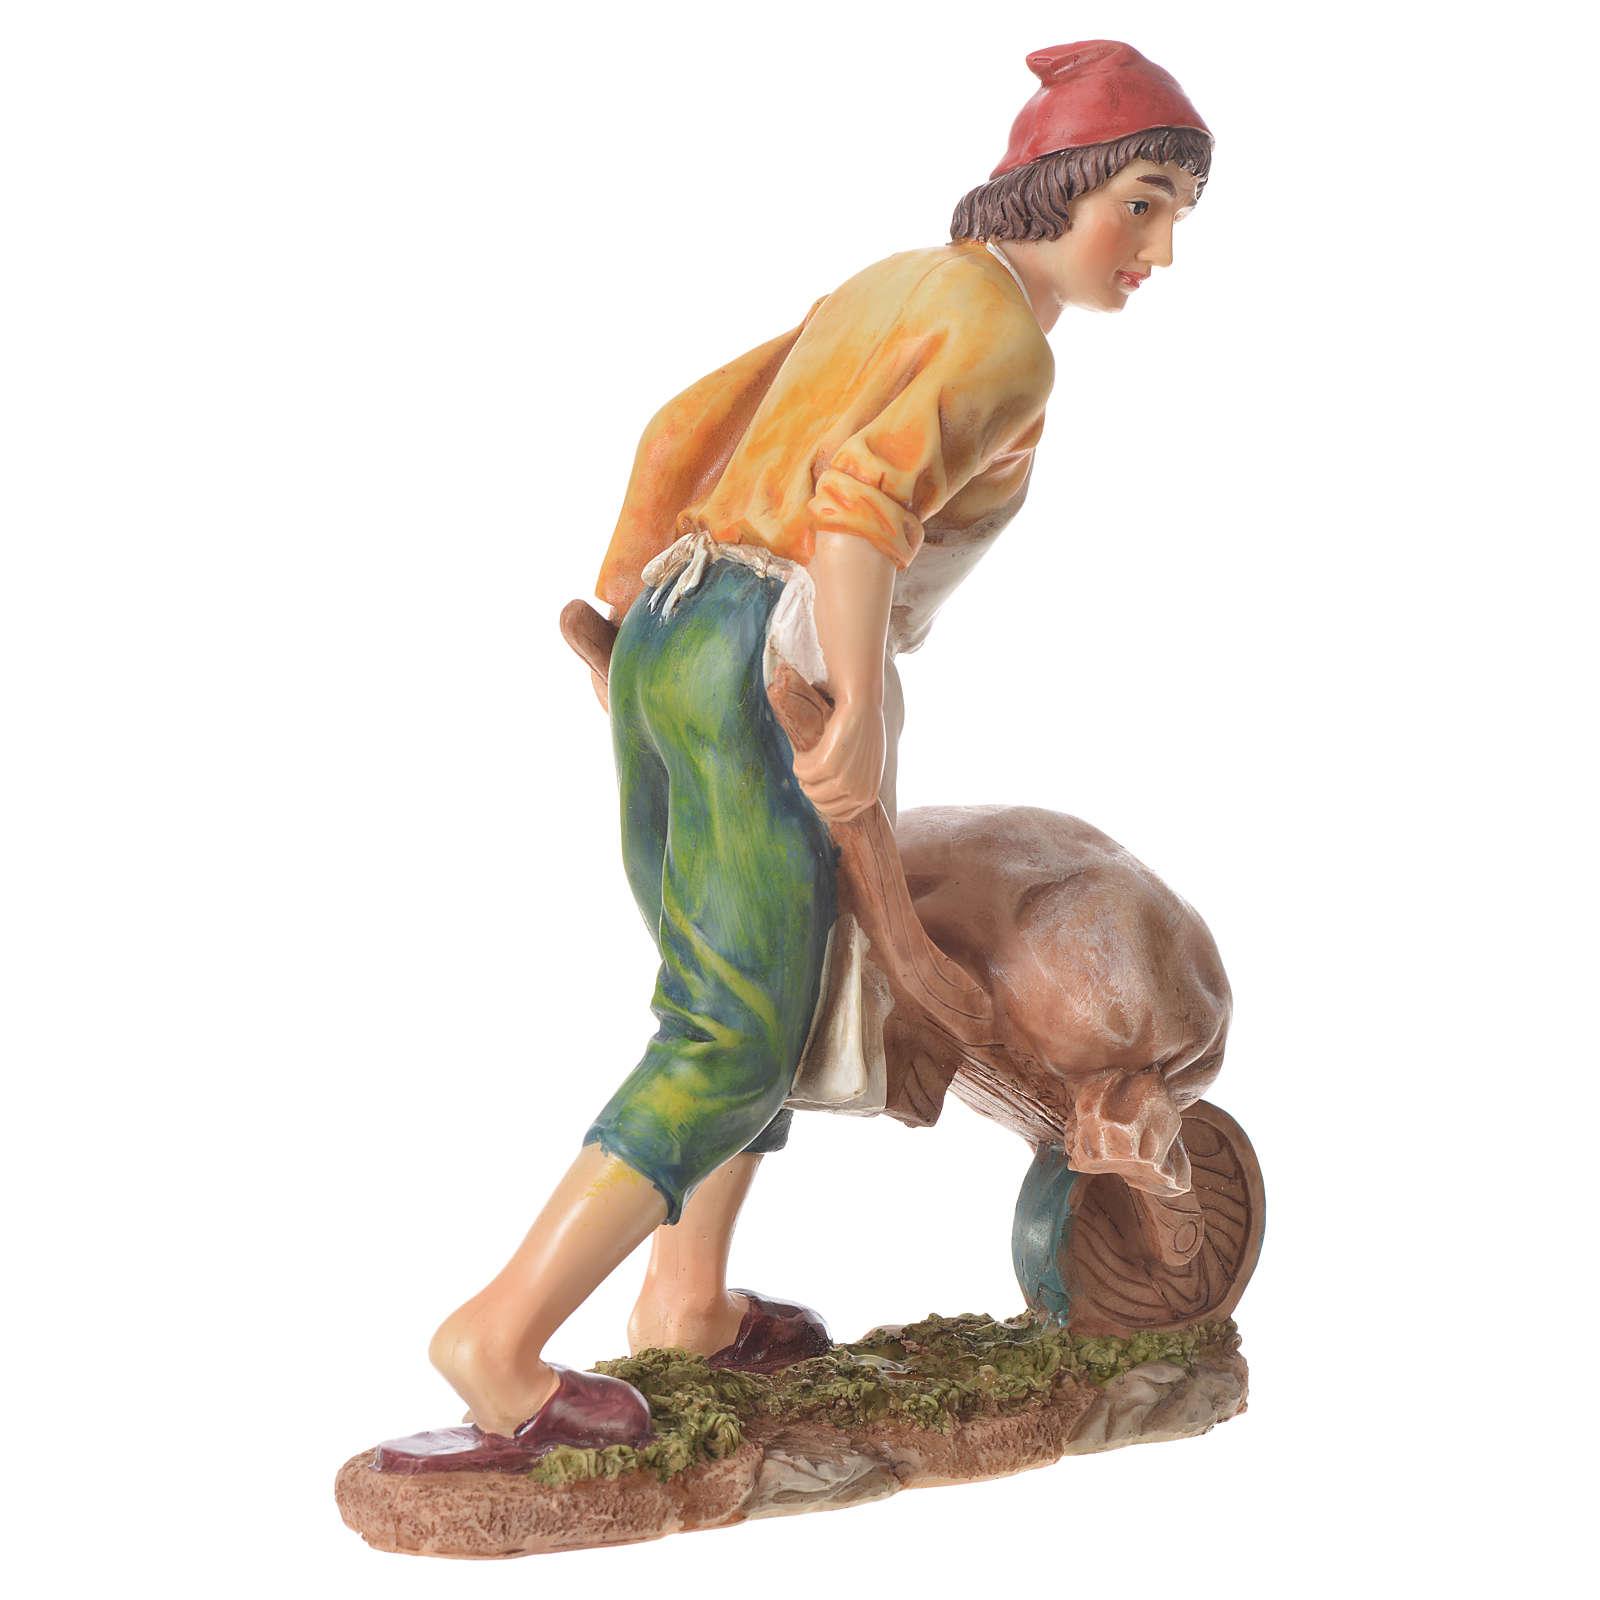 Hombre con carretilla para belenes de 30cm, resina 3